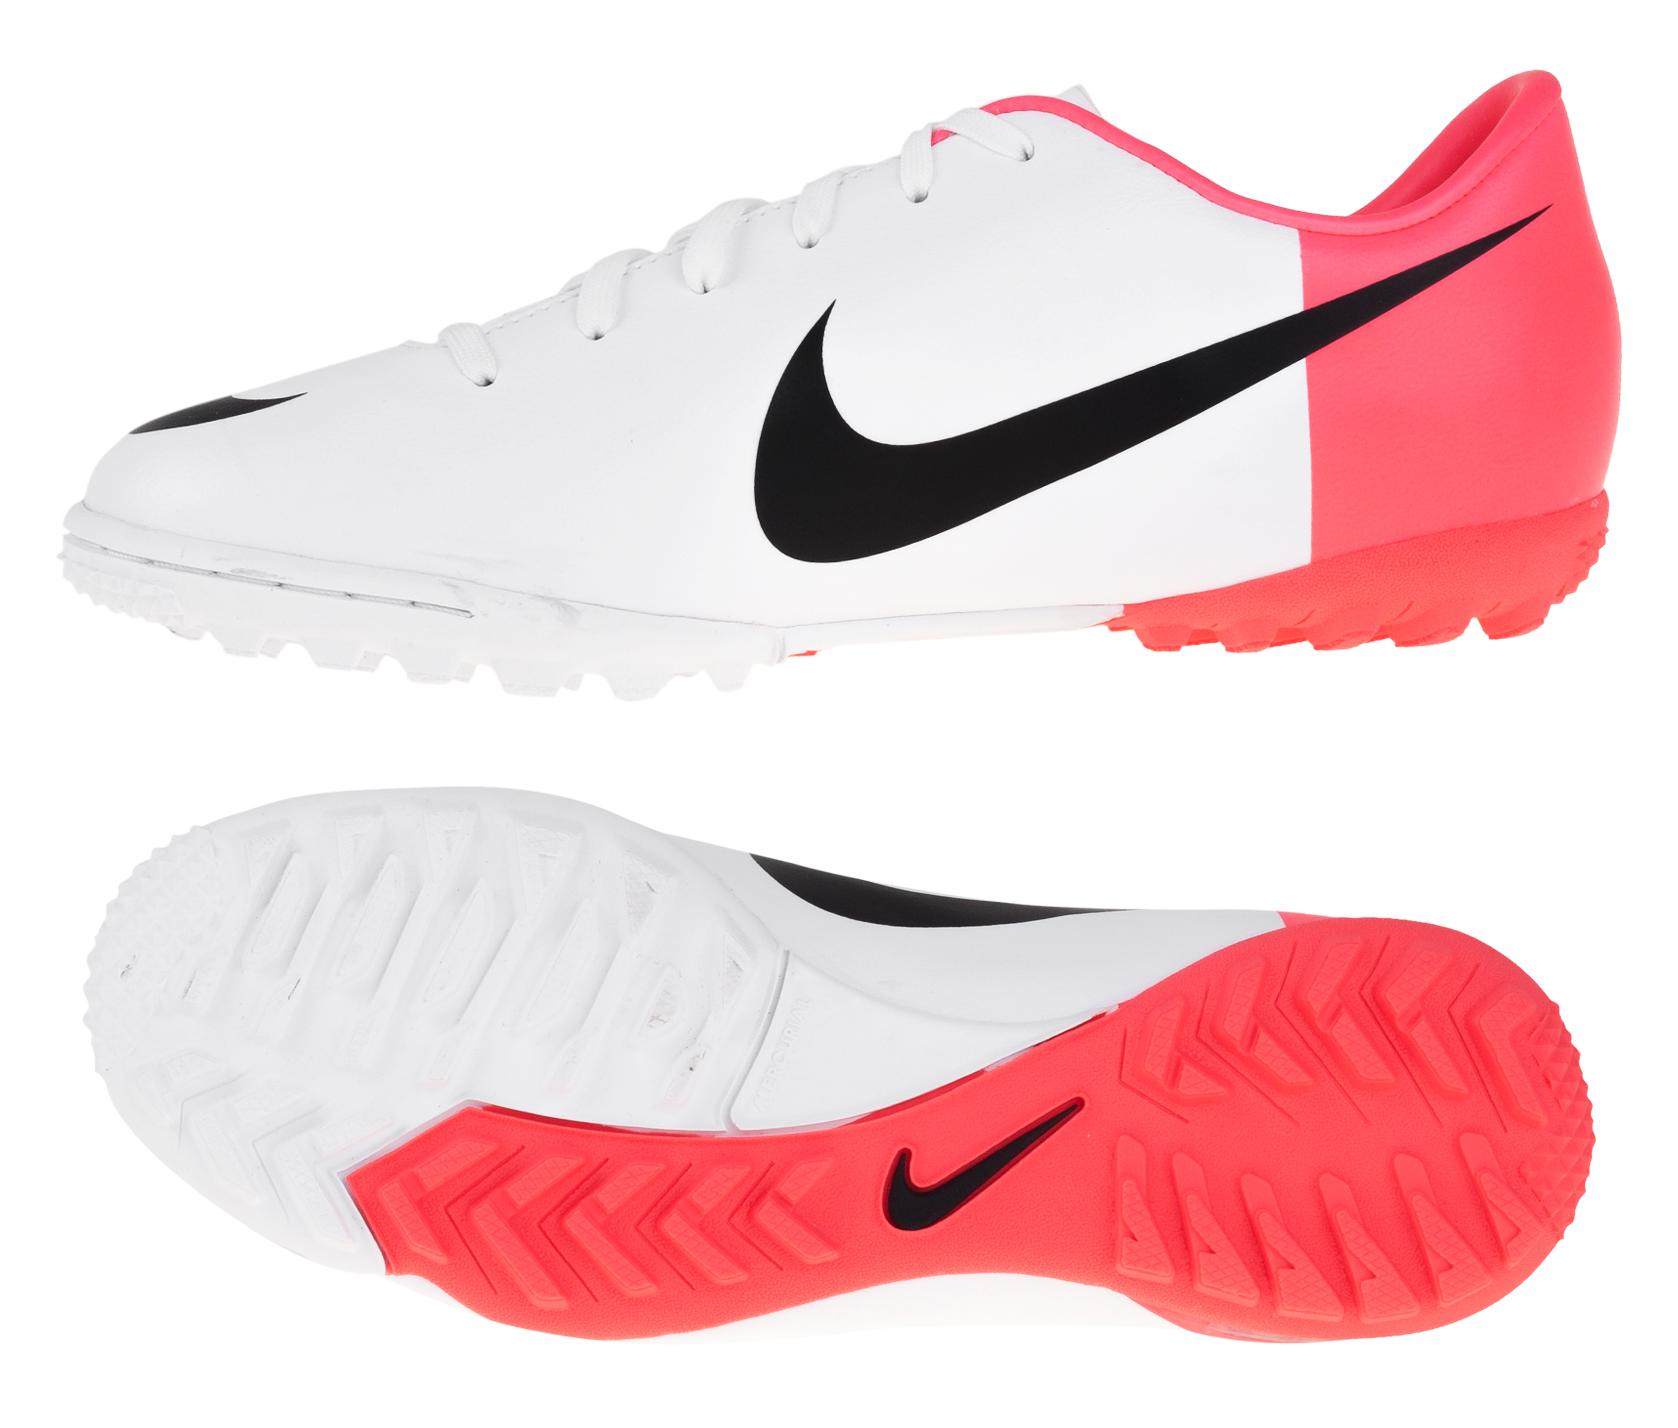 Nike - Mercurial Glide TF Hvid/Rød Børn